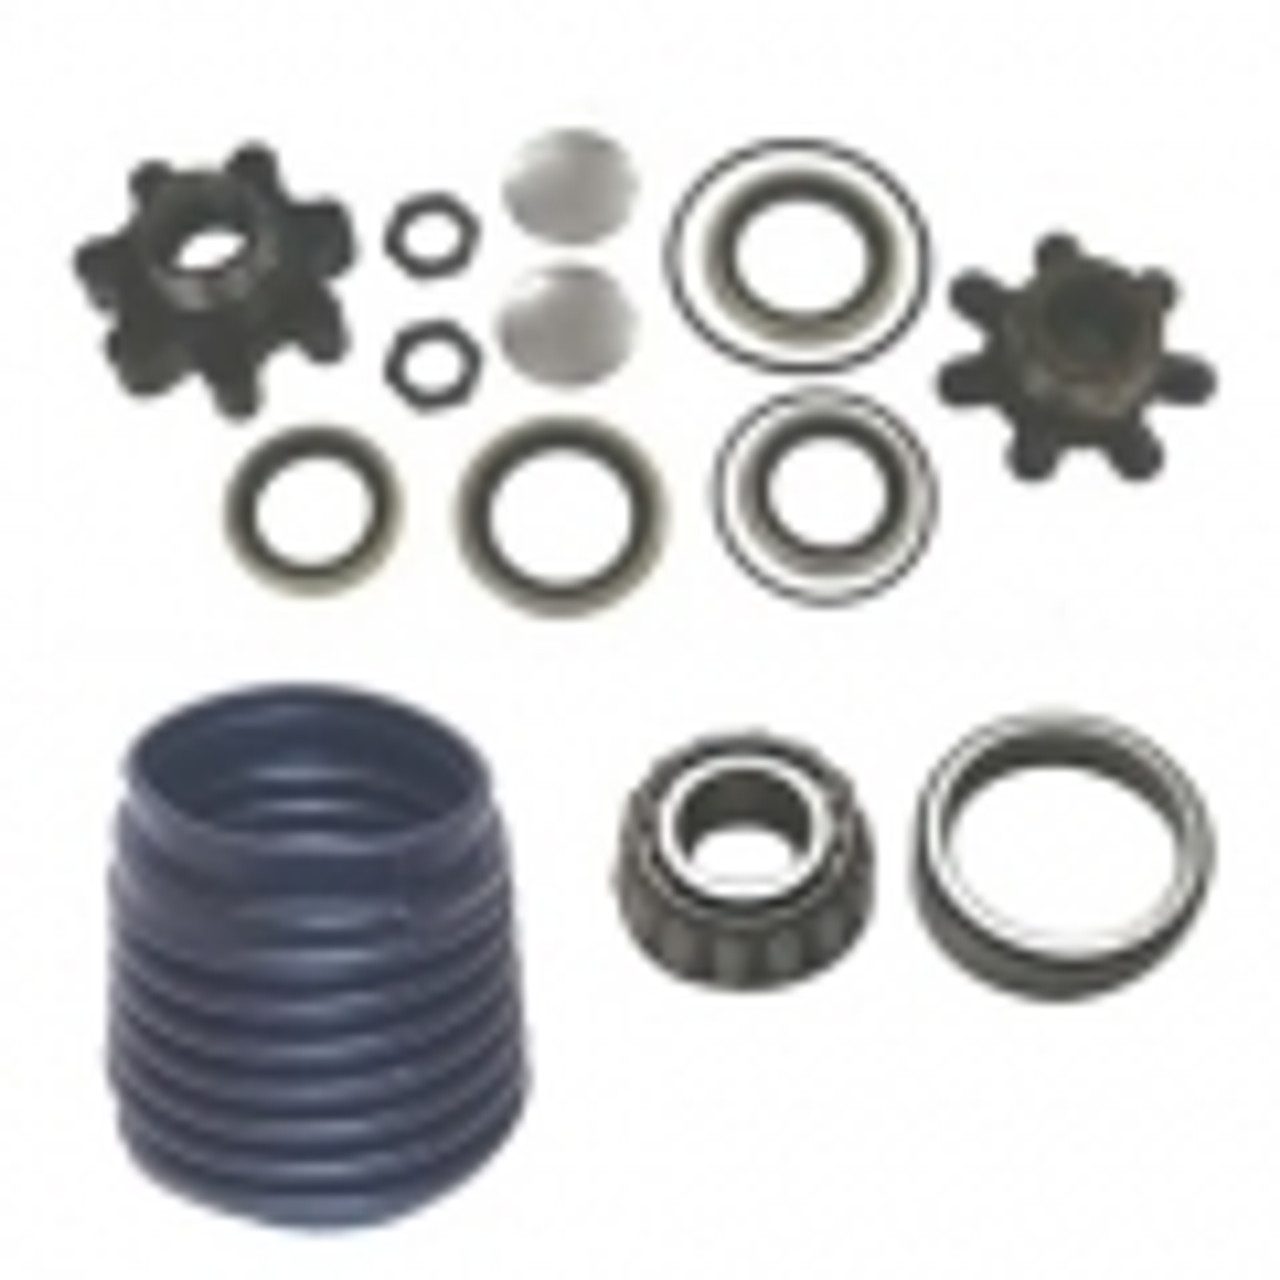 OMC Sterndrive Parts | Wholesale Marine